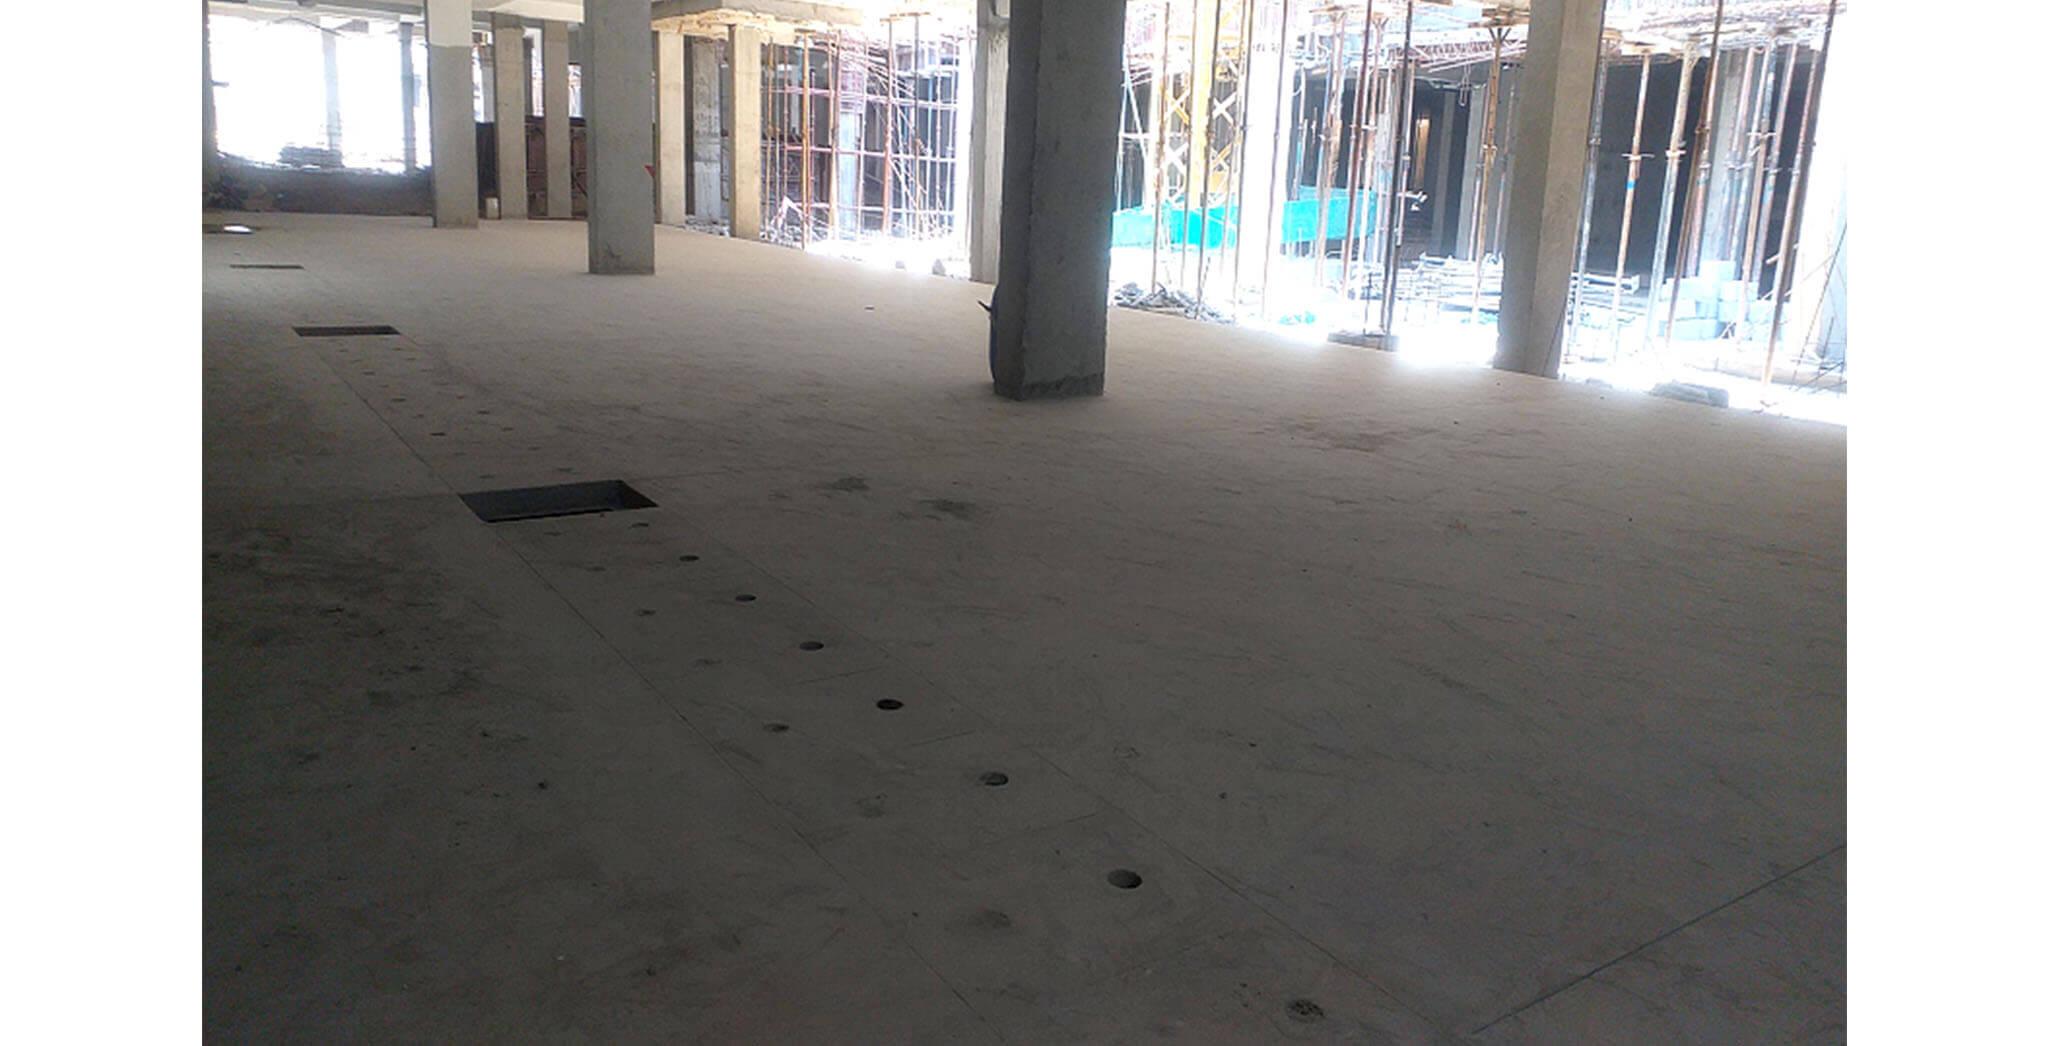 Feb 2021 - Basement level: Basement Flooring work-in-progress at K, L, M, N & P blocks